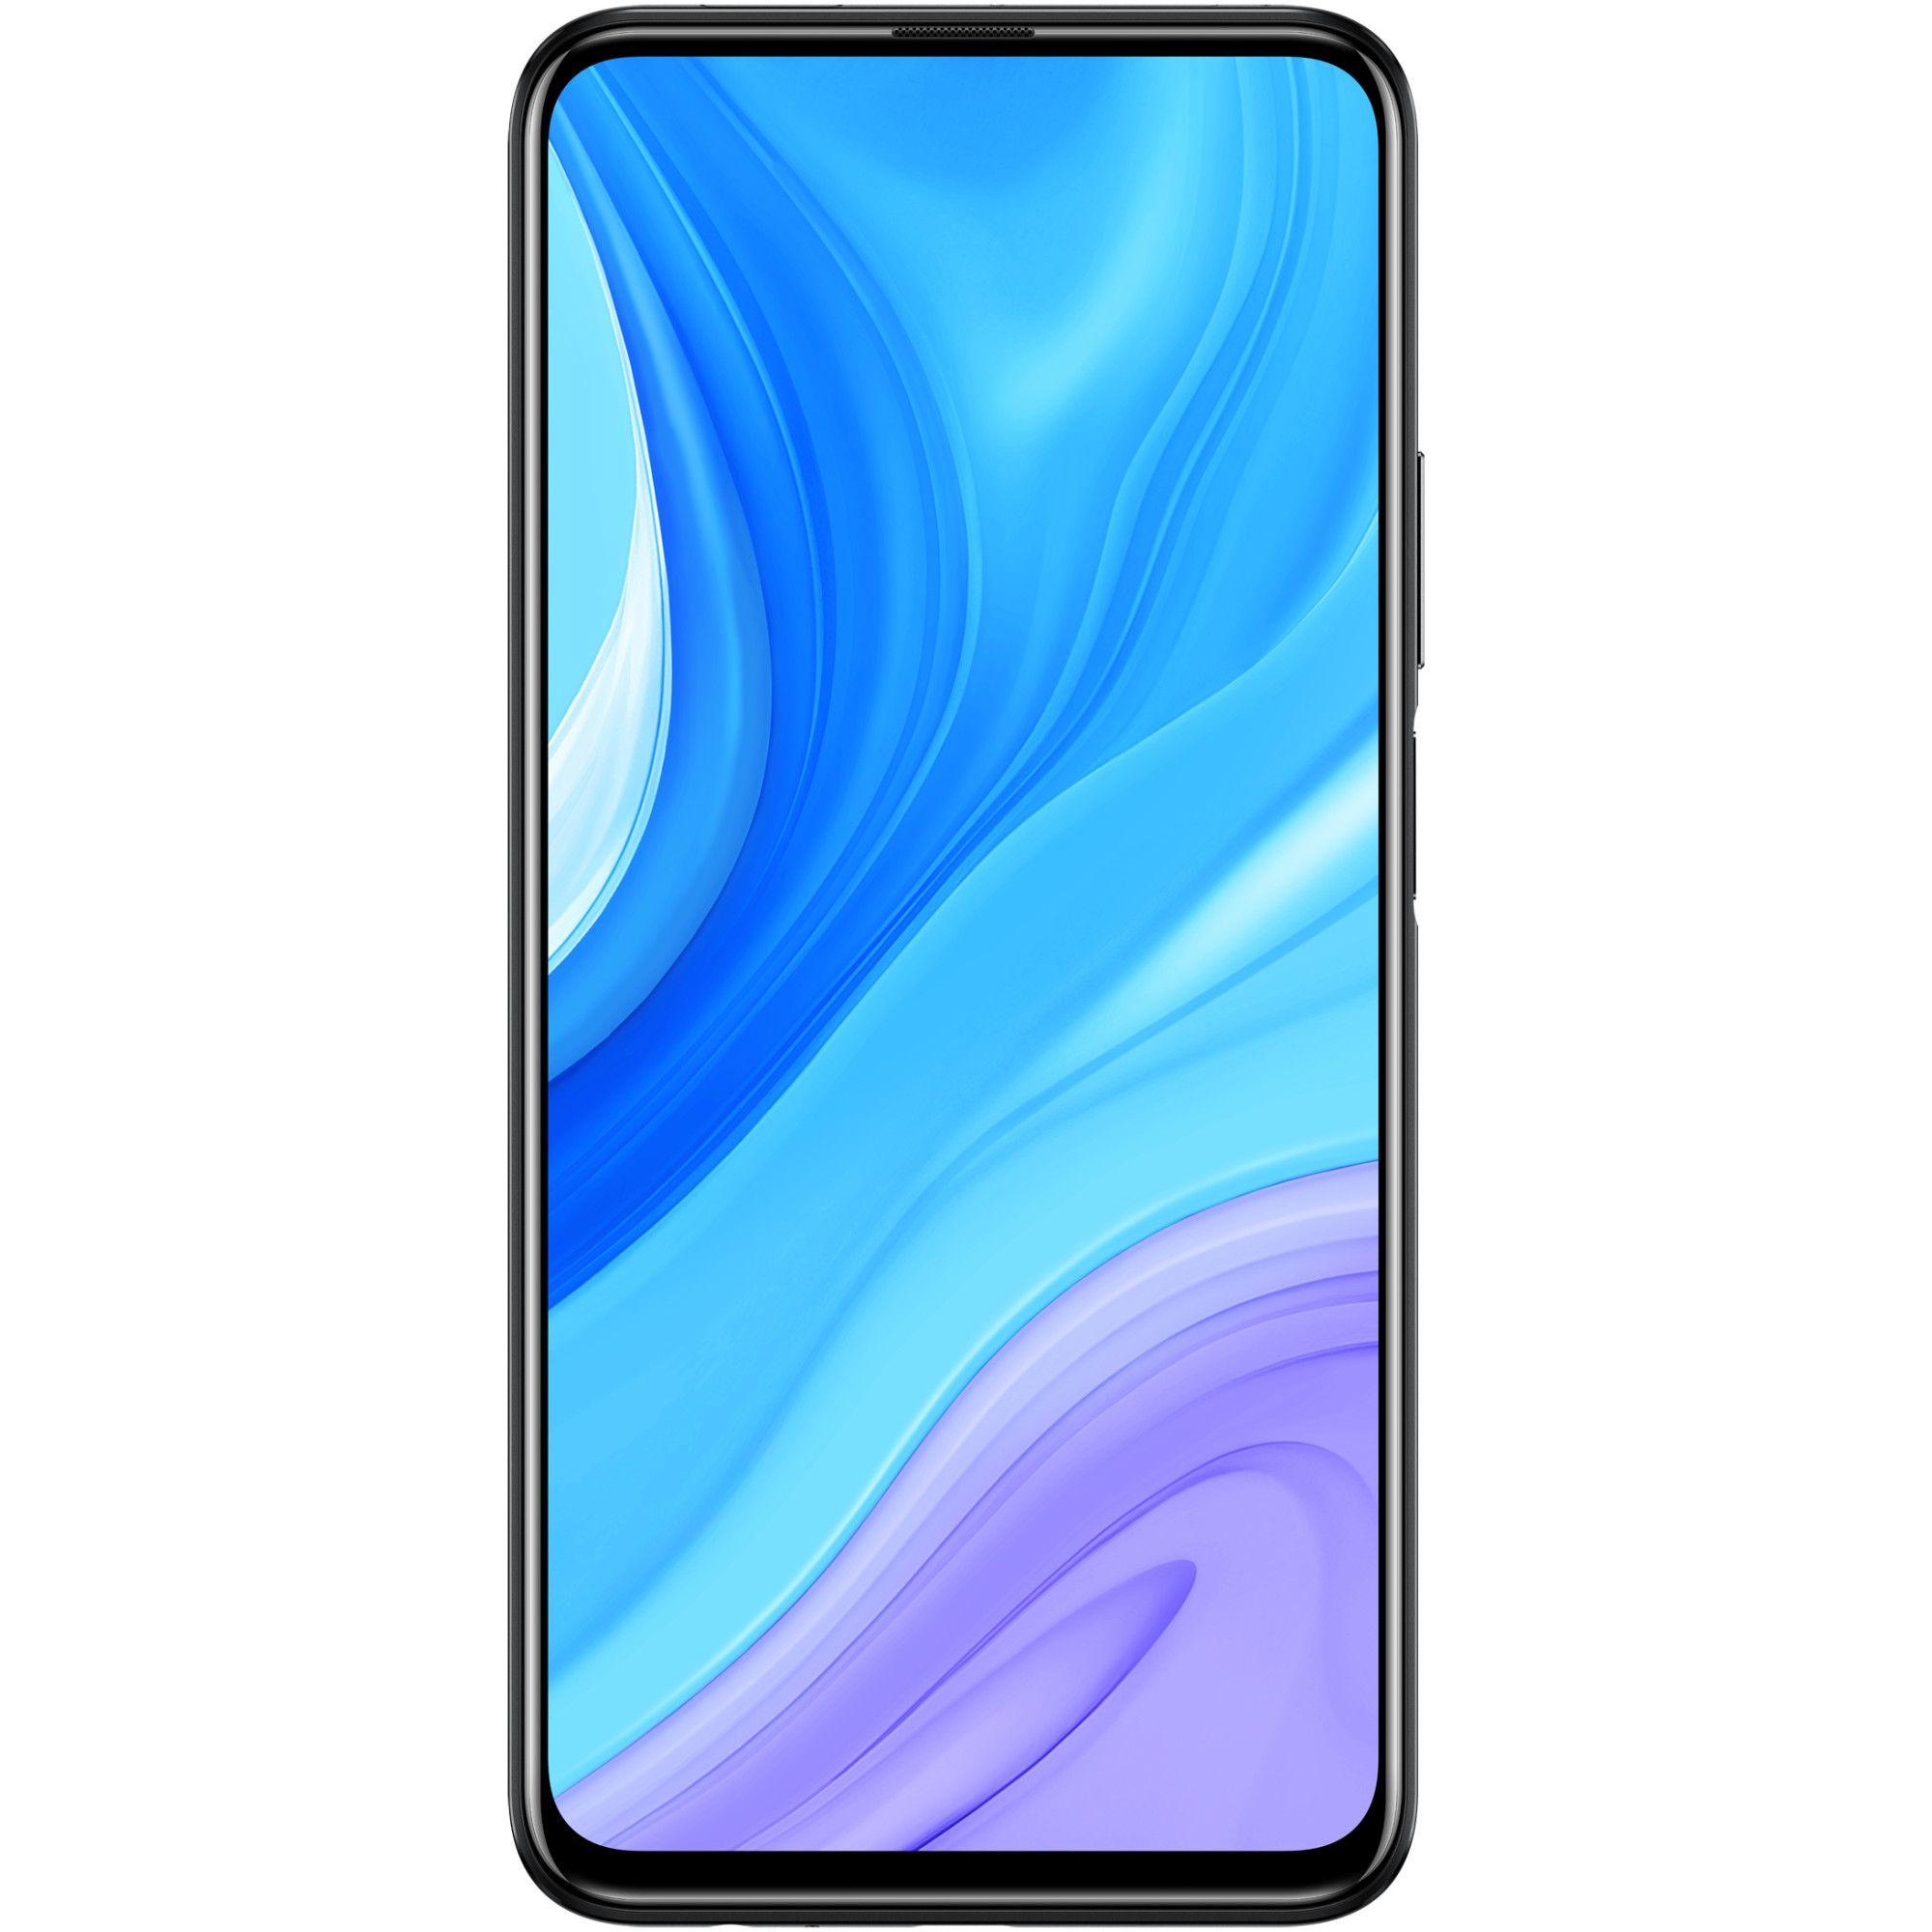 Telefon mobil Huawei P Smart Pro, Dual SIM, 128GB, 6GB RAM, 4G, Midnight Black